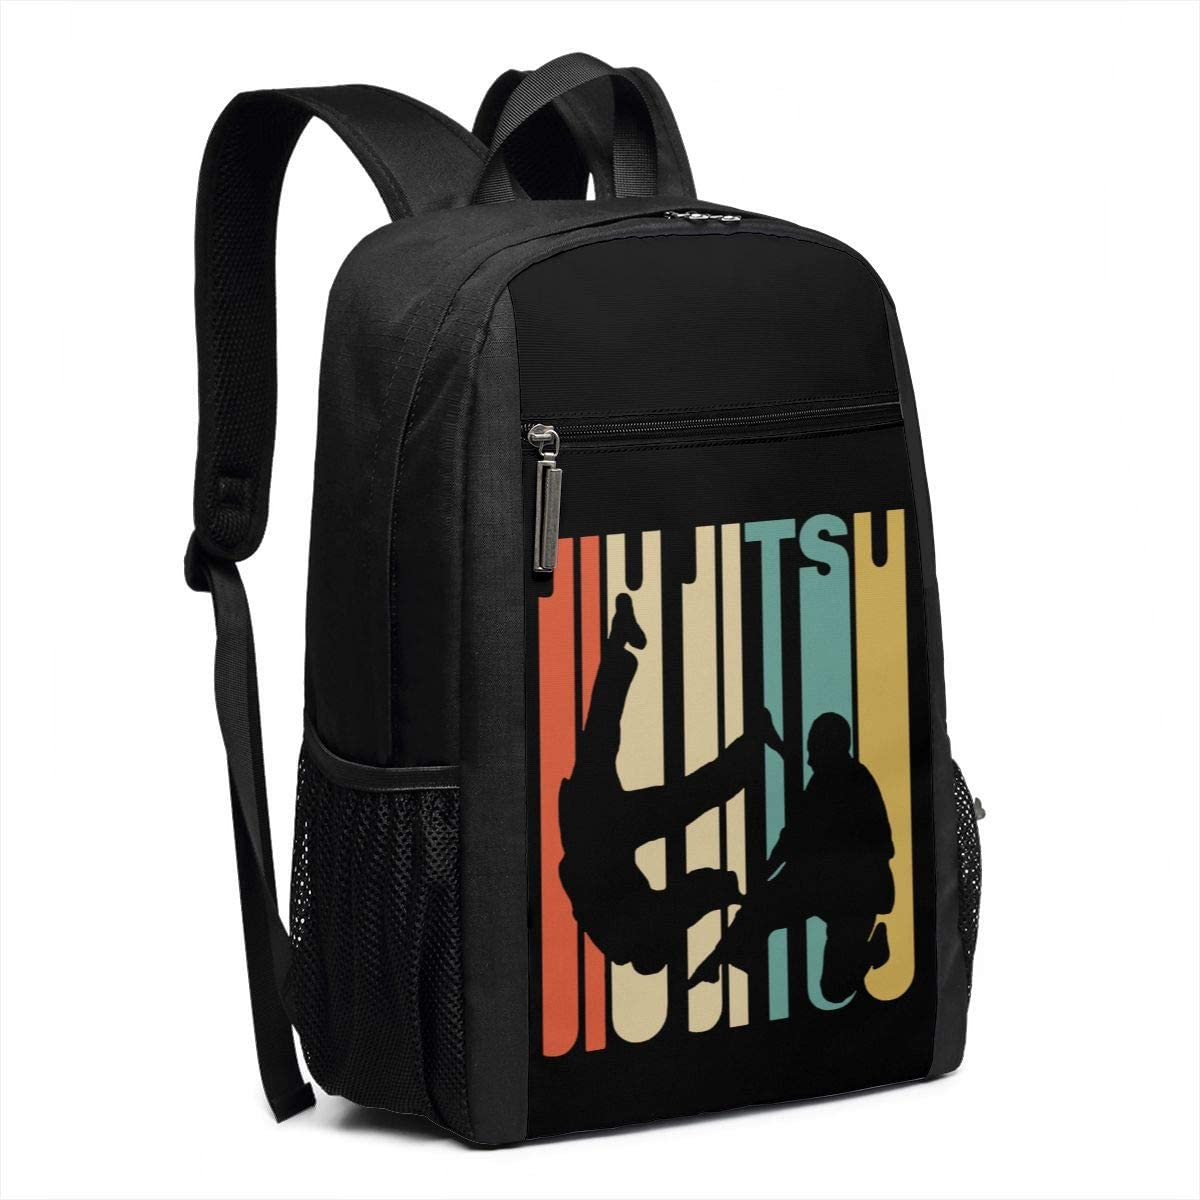 Vintage Style Jiu Jitsu Silhouette 17 Inch Business Bag for Teens Black